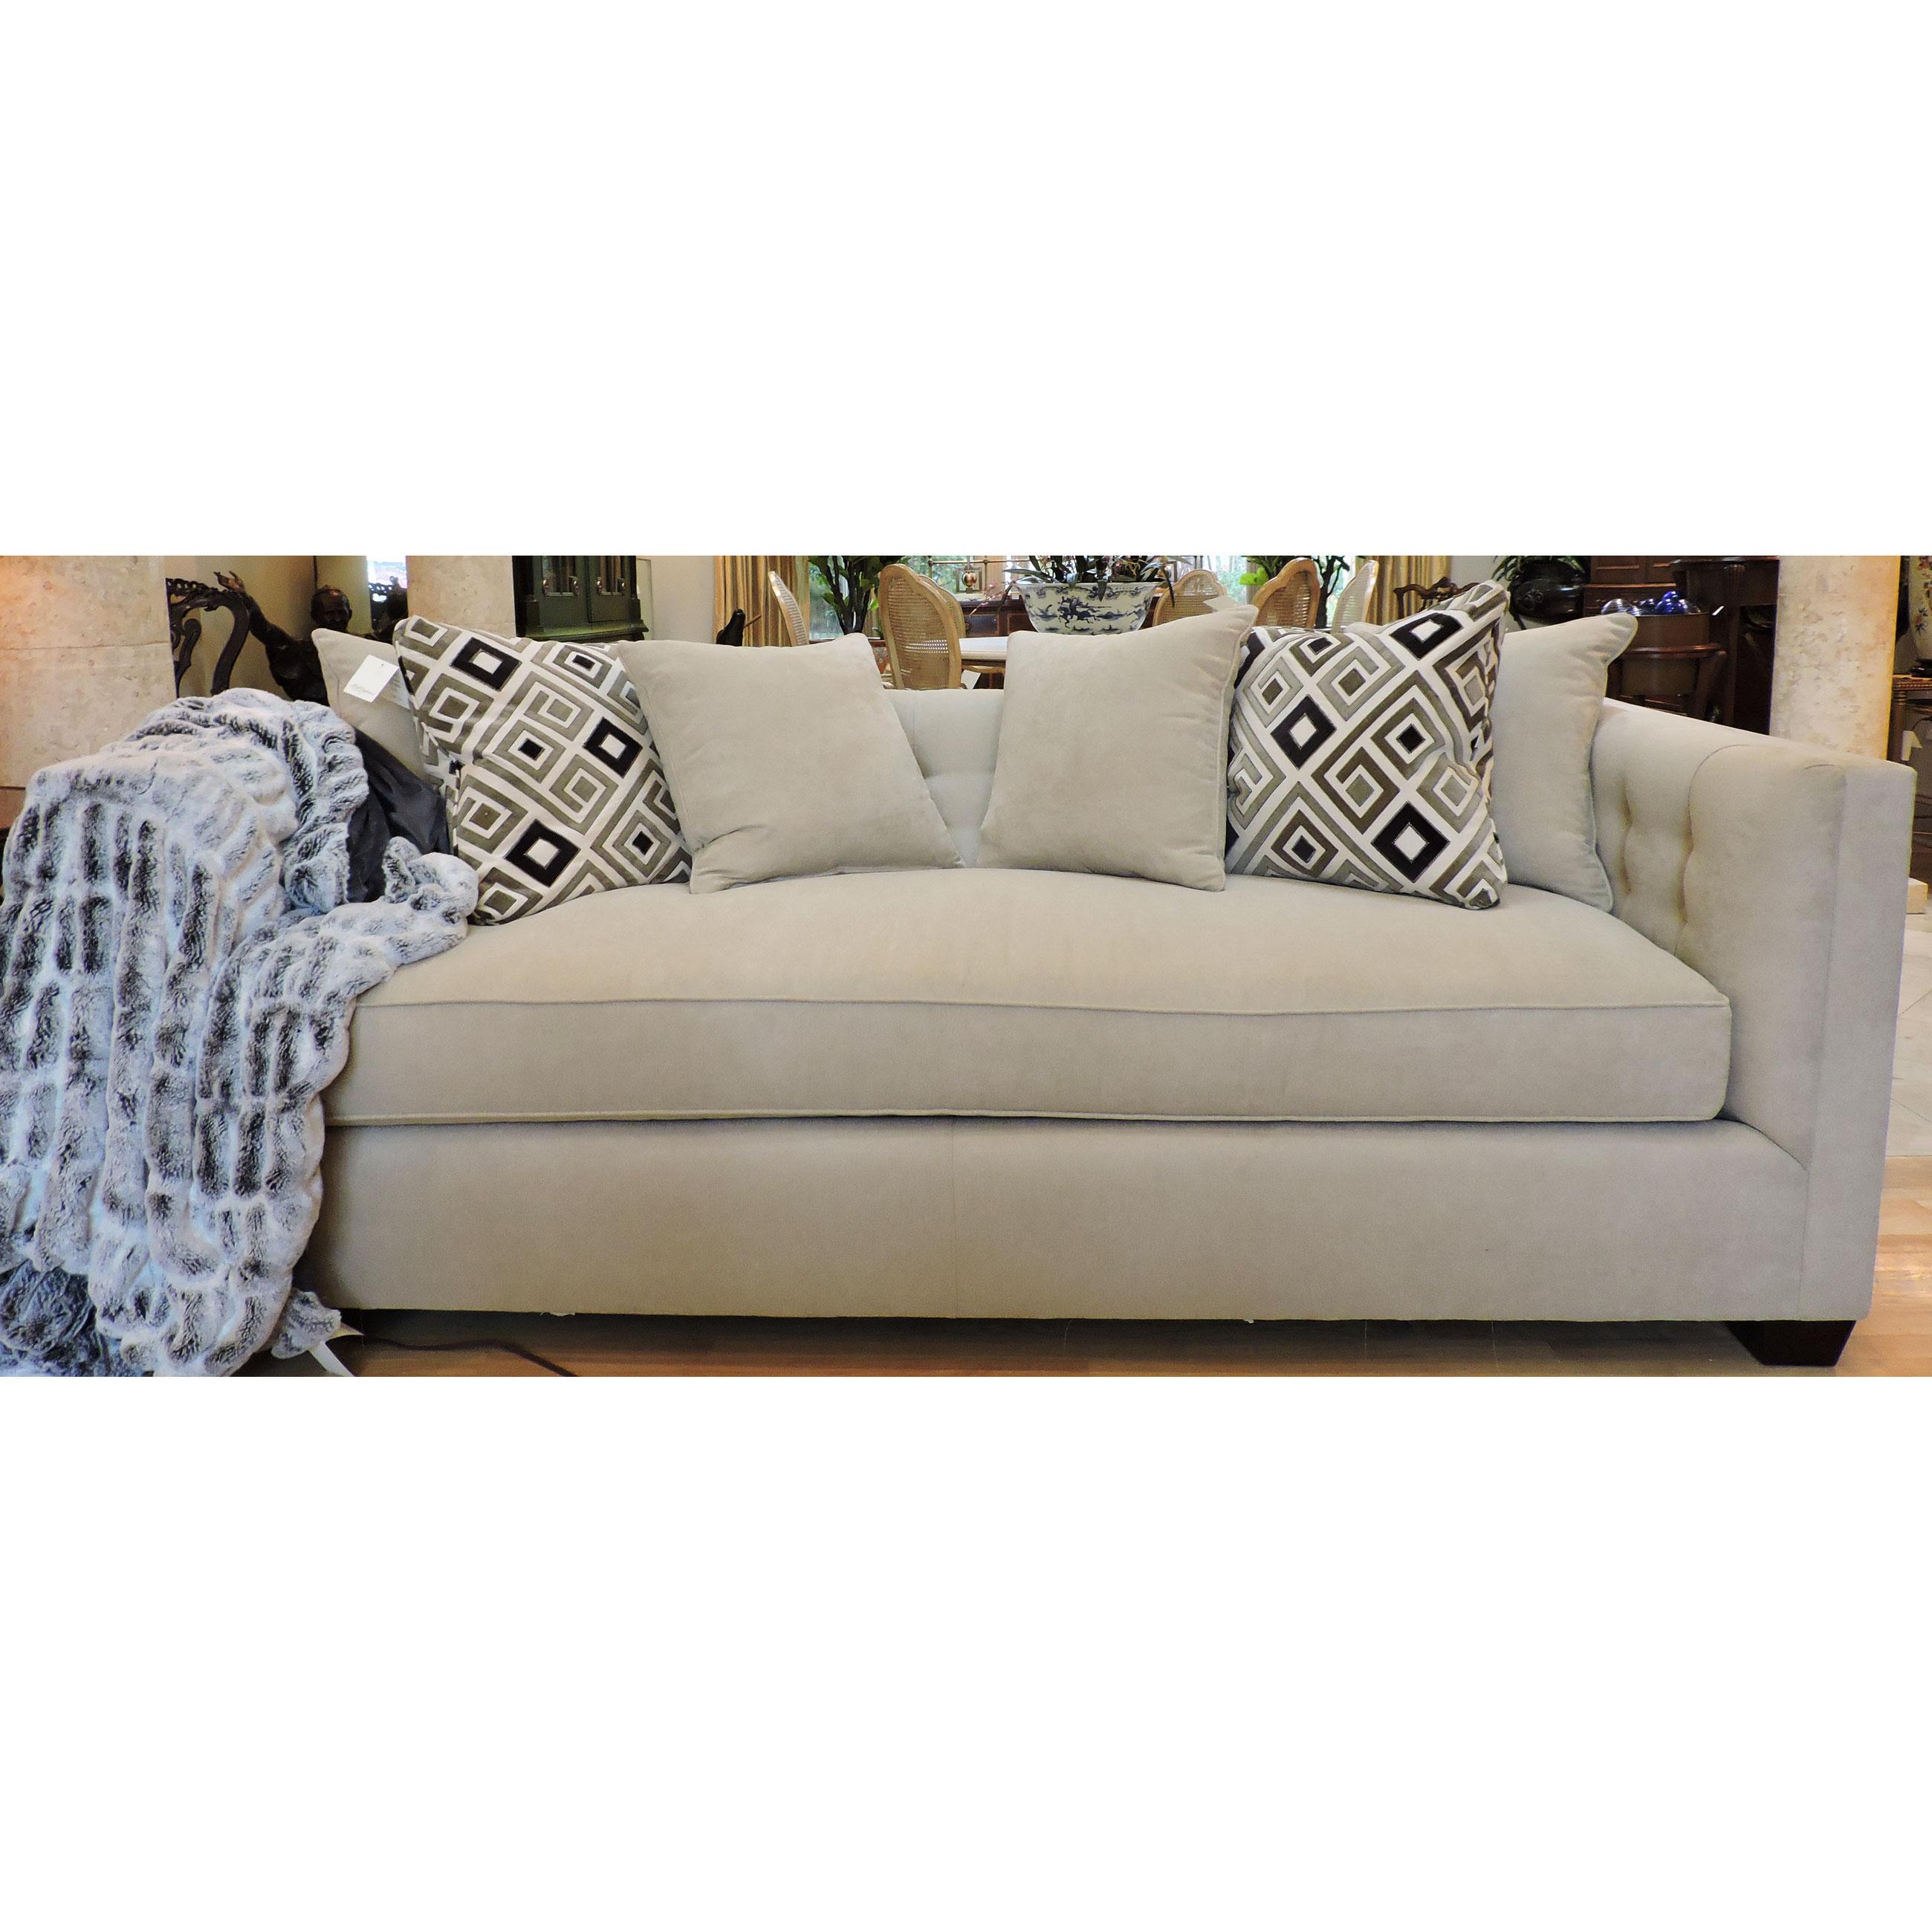 single cushion sofa beth claybourn interiors. Black Bedroom Furniture Sets. Home Design Ideas